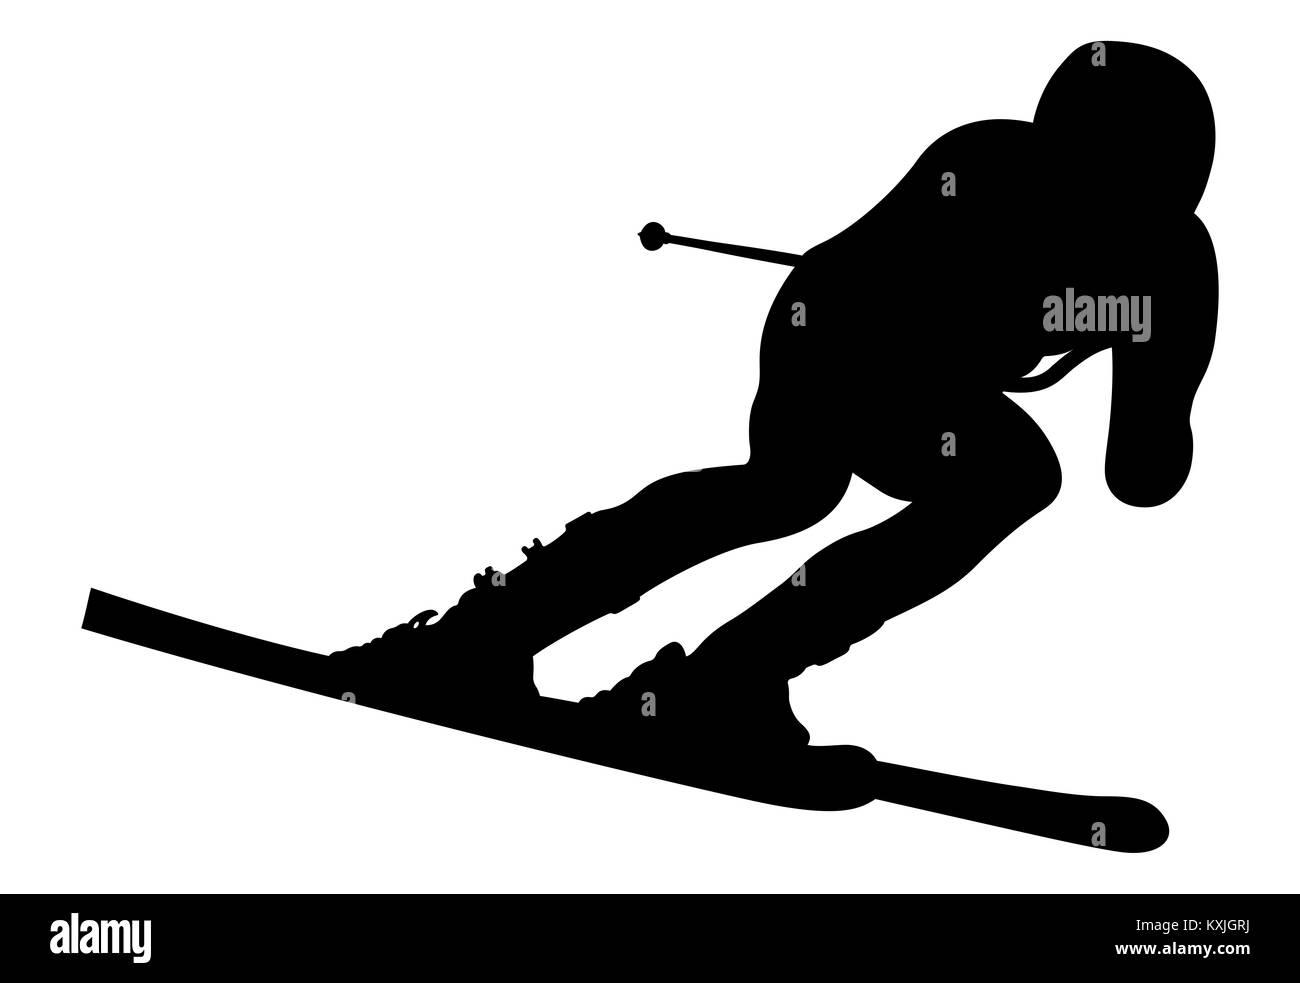 dynamic athlete skier in alpine skiing downhill - Stock Image